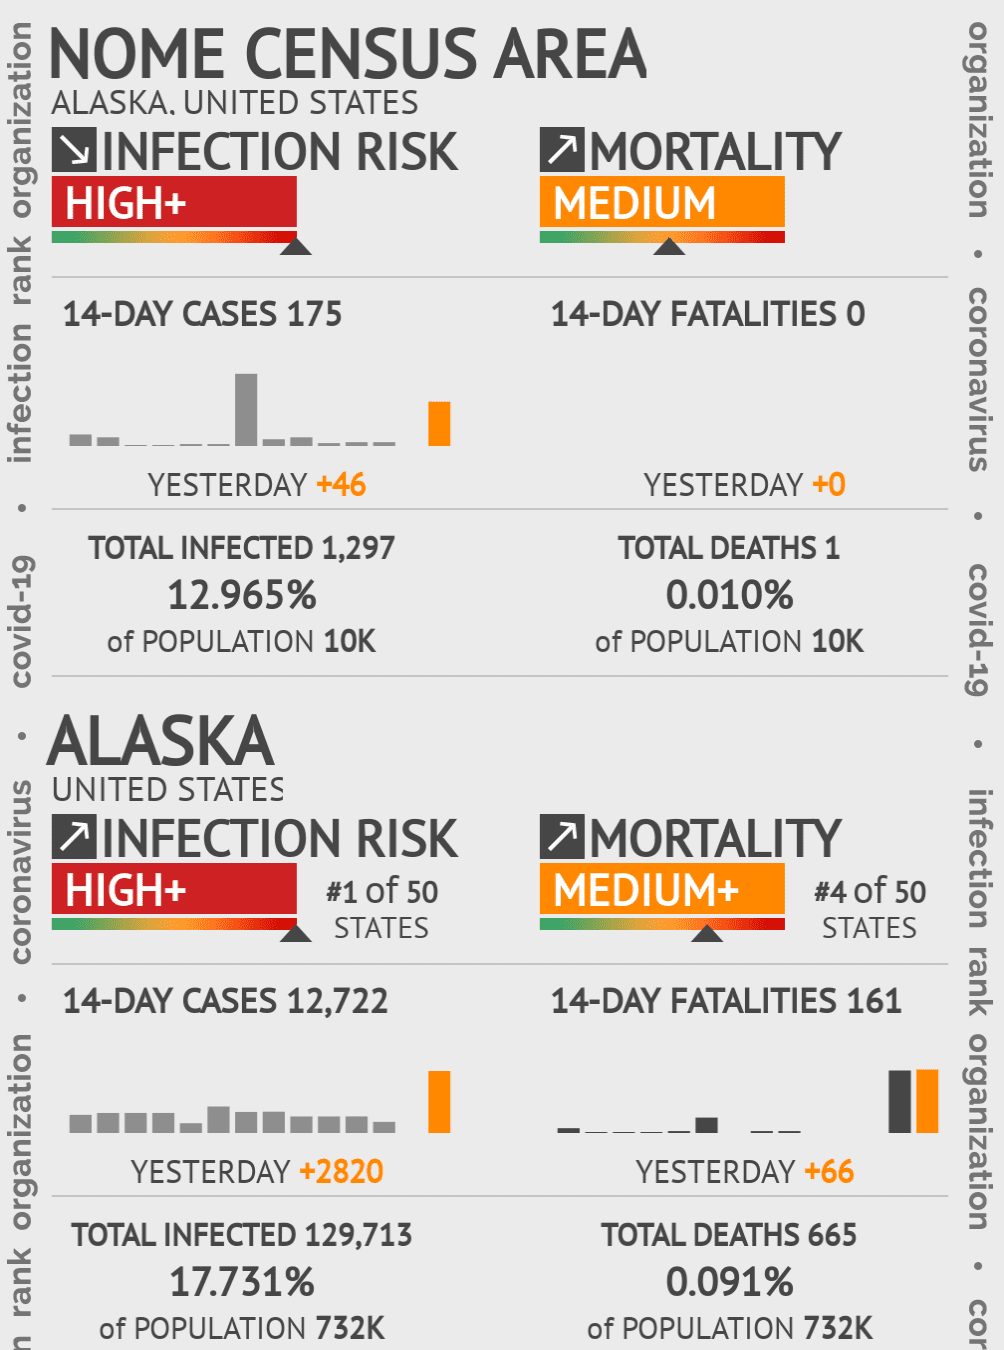 Nome Census Area Coronavirus Covid-19 Risk of Infection on March 04, 2021